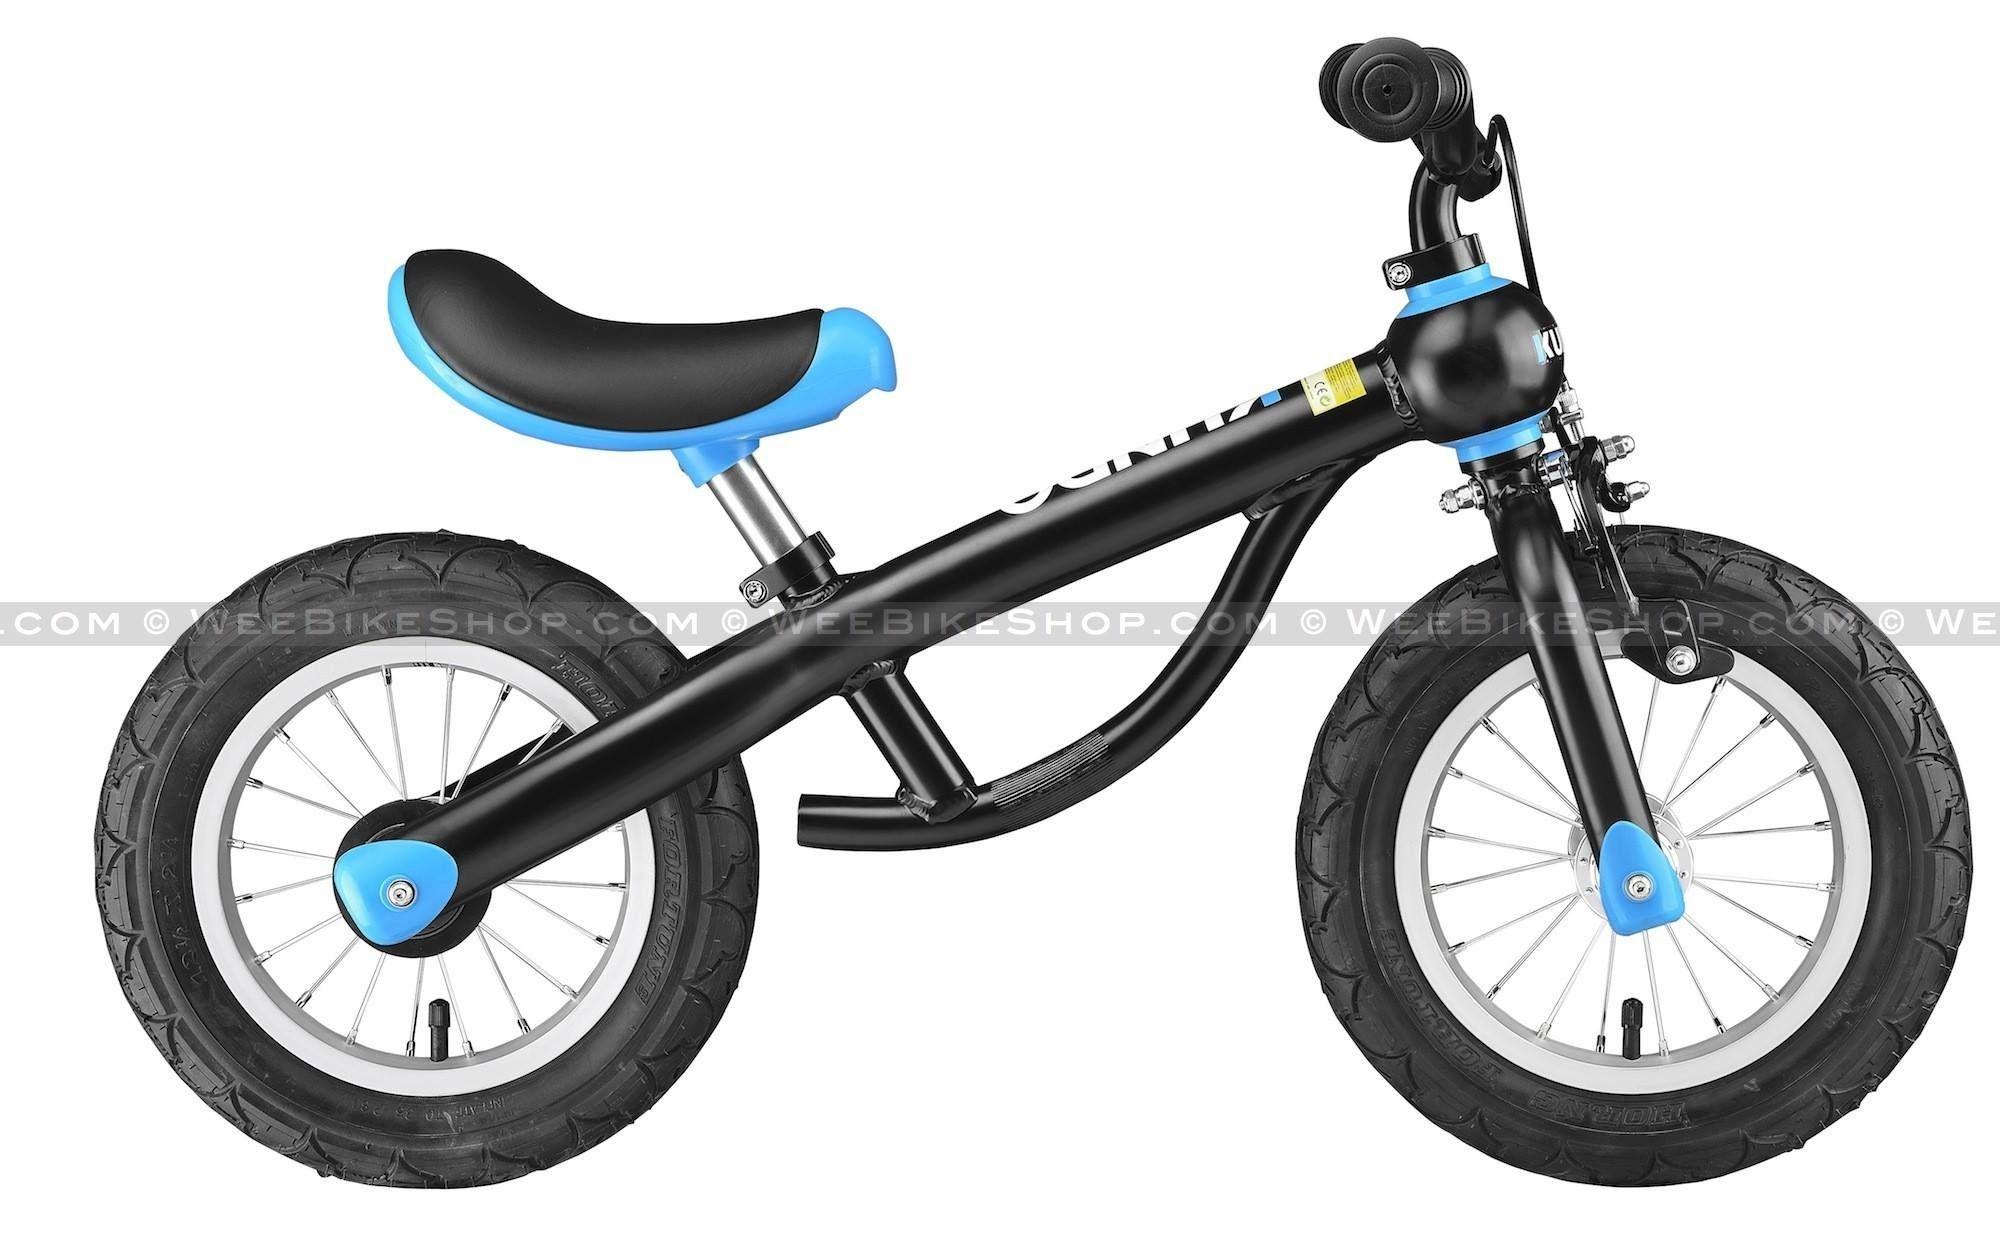 "Kundo Smarttrail-12 Blue  Kundo Smarttrail balance bike is transformed into a 12"" pedal bike! #balancebike #convertiblebike #kundousa"